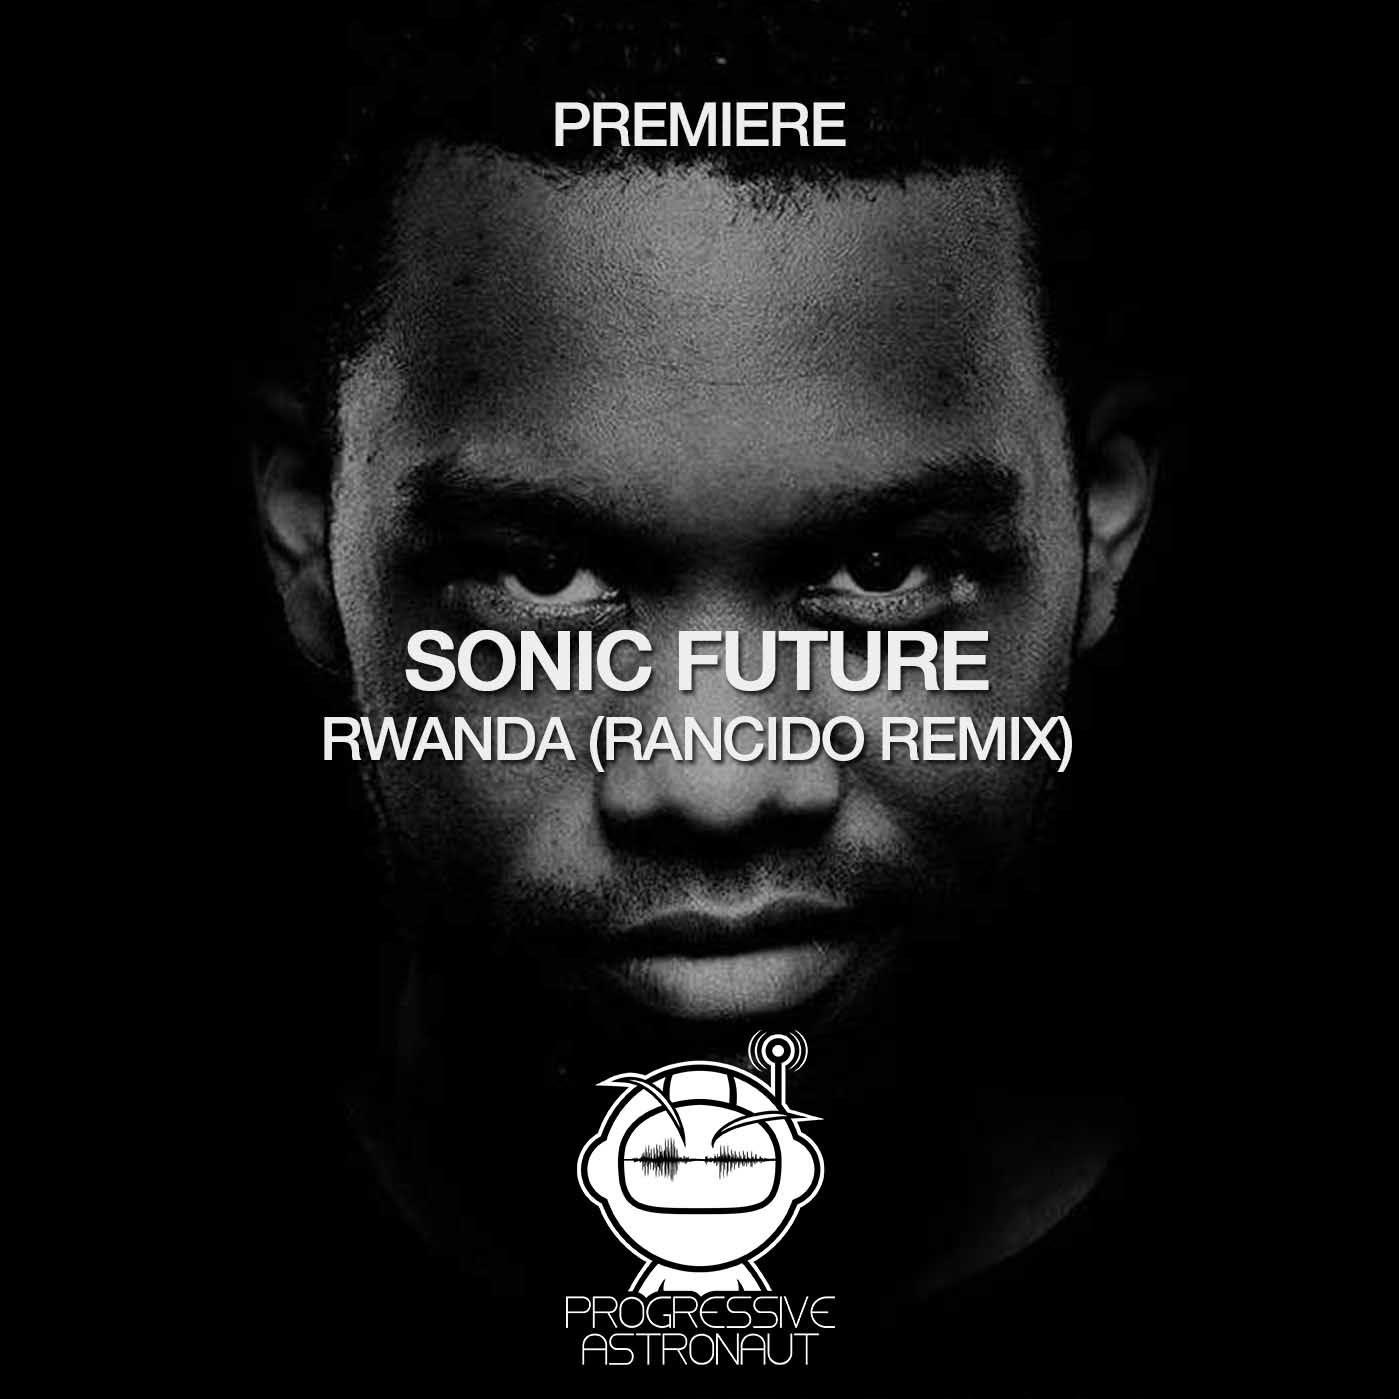 Sonic Future - Rwanda (Rancido Remix)